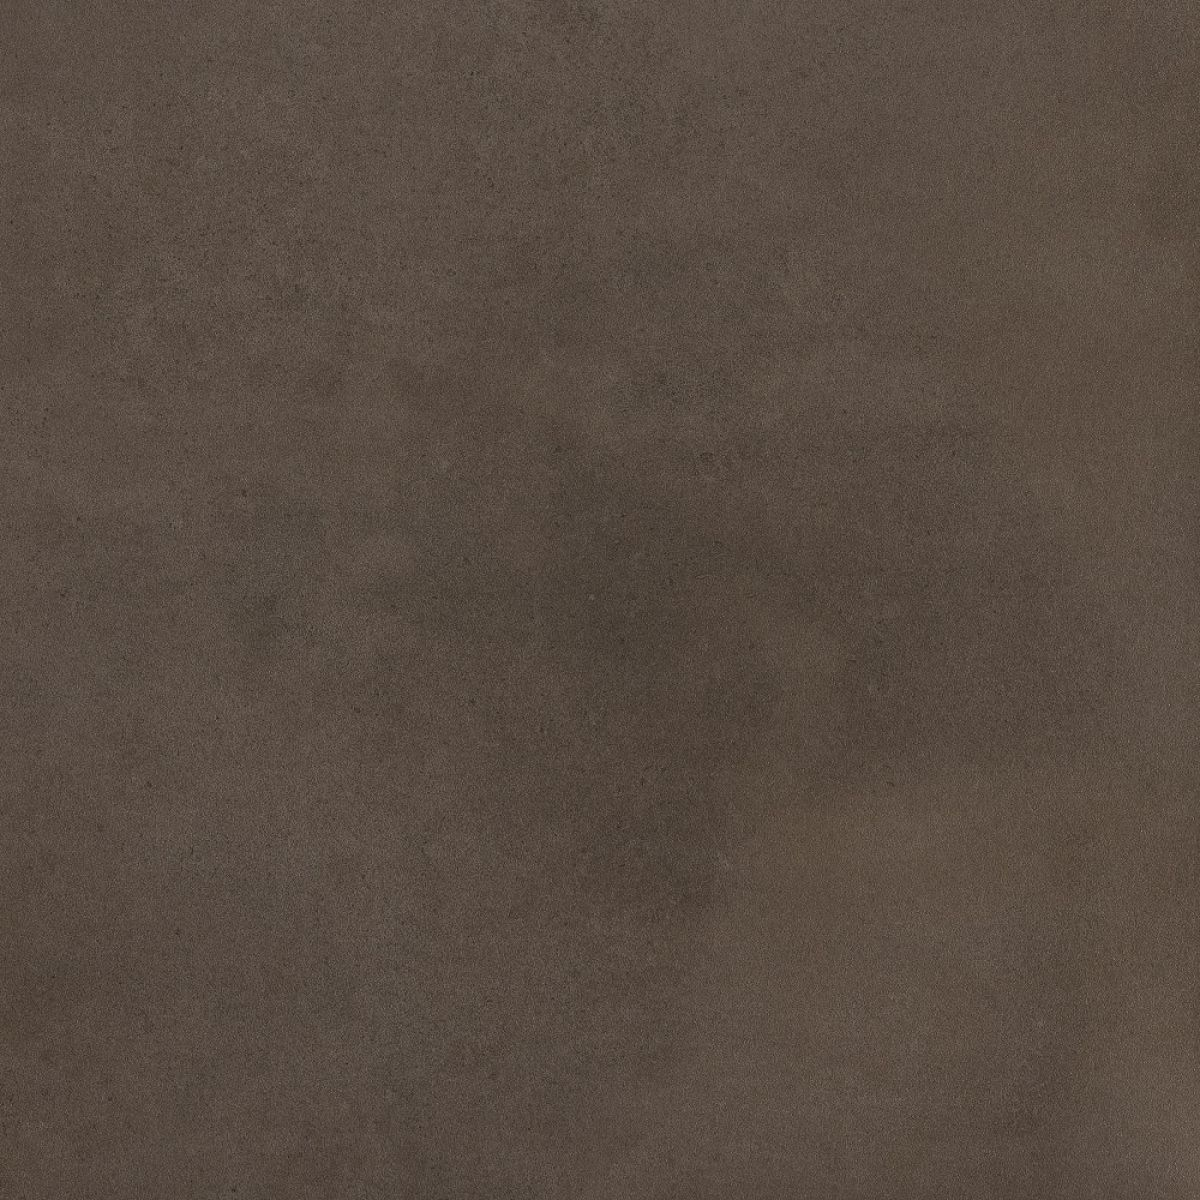 RAK Surface Matt Dark Greige Tile 300 x 600mm